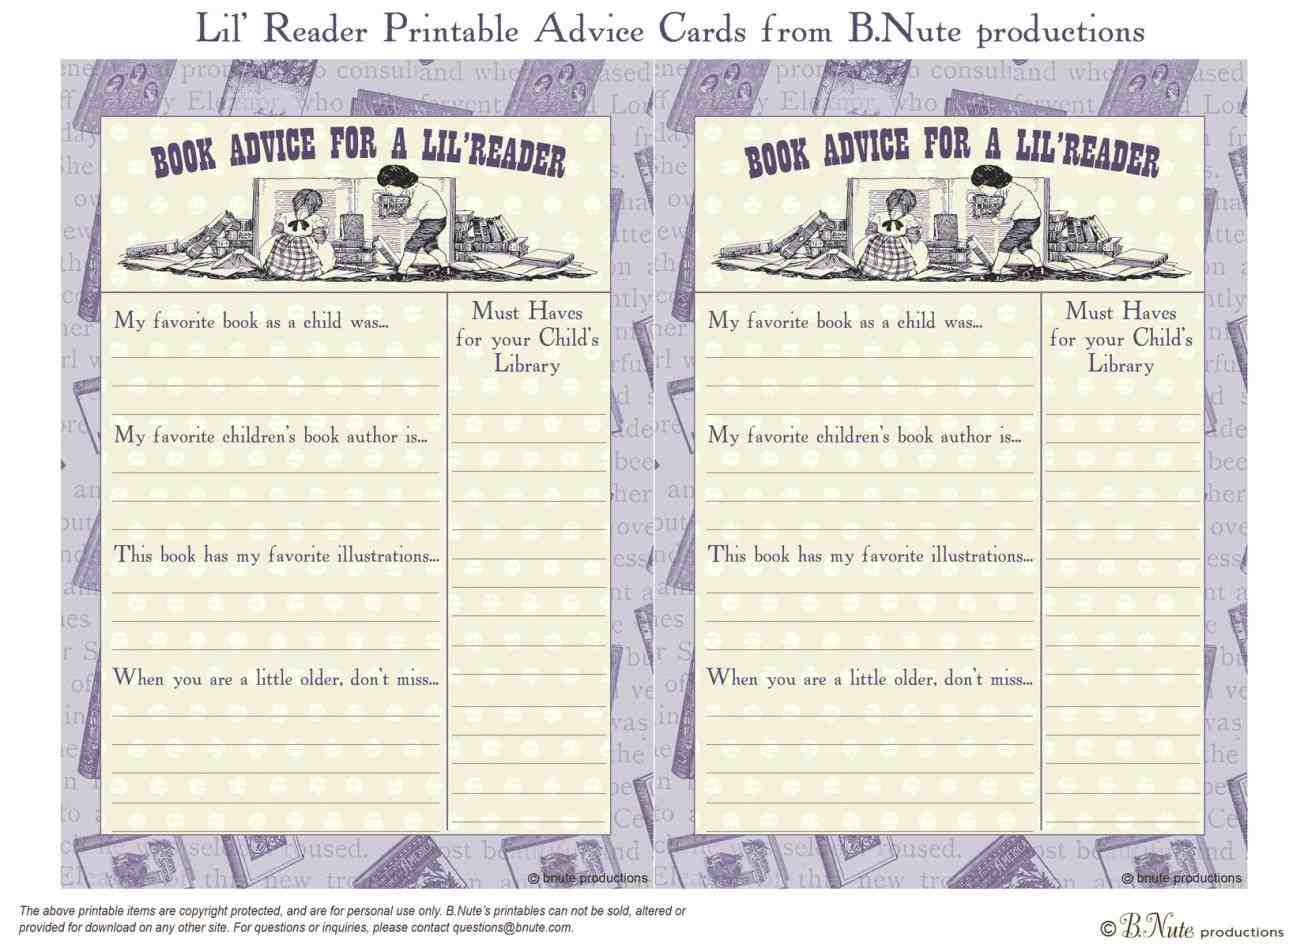 School Graduation Program Awesome Should I Avoid Rhtechthatinfo - Free Printable Graduation Advice Cards